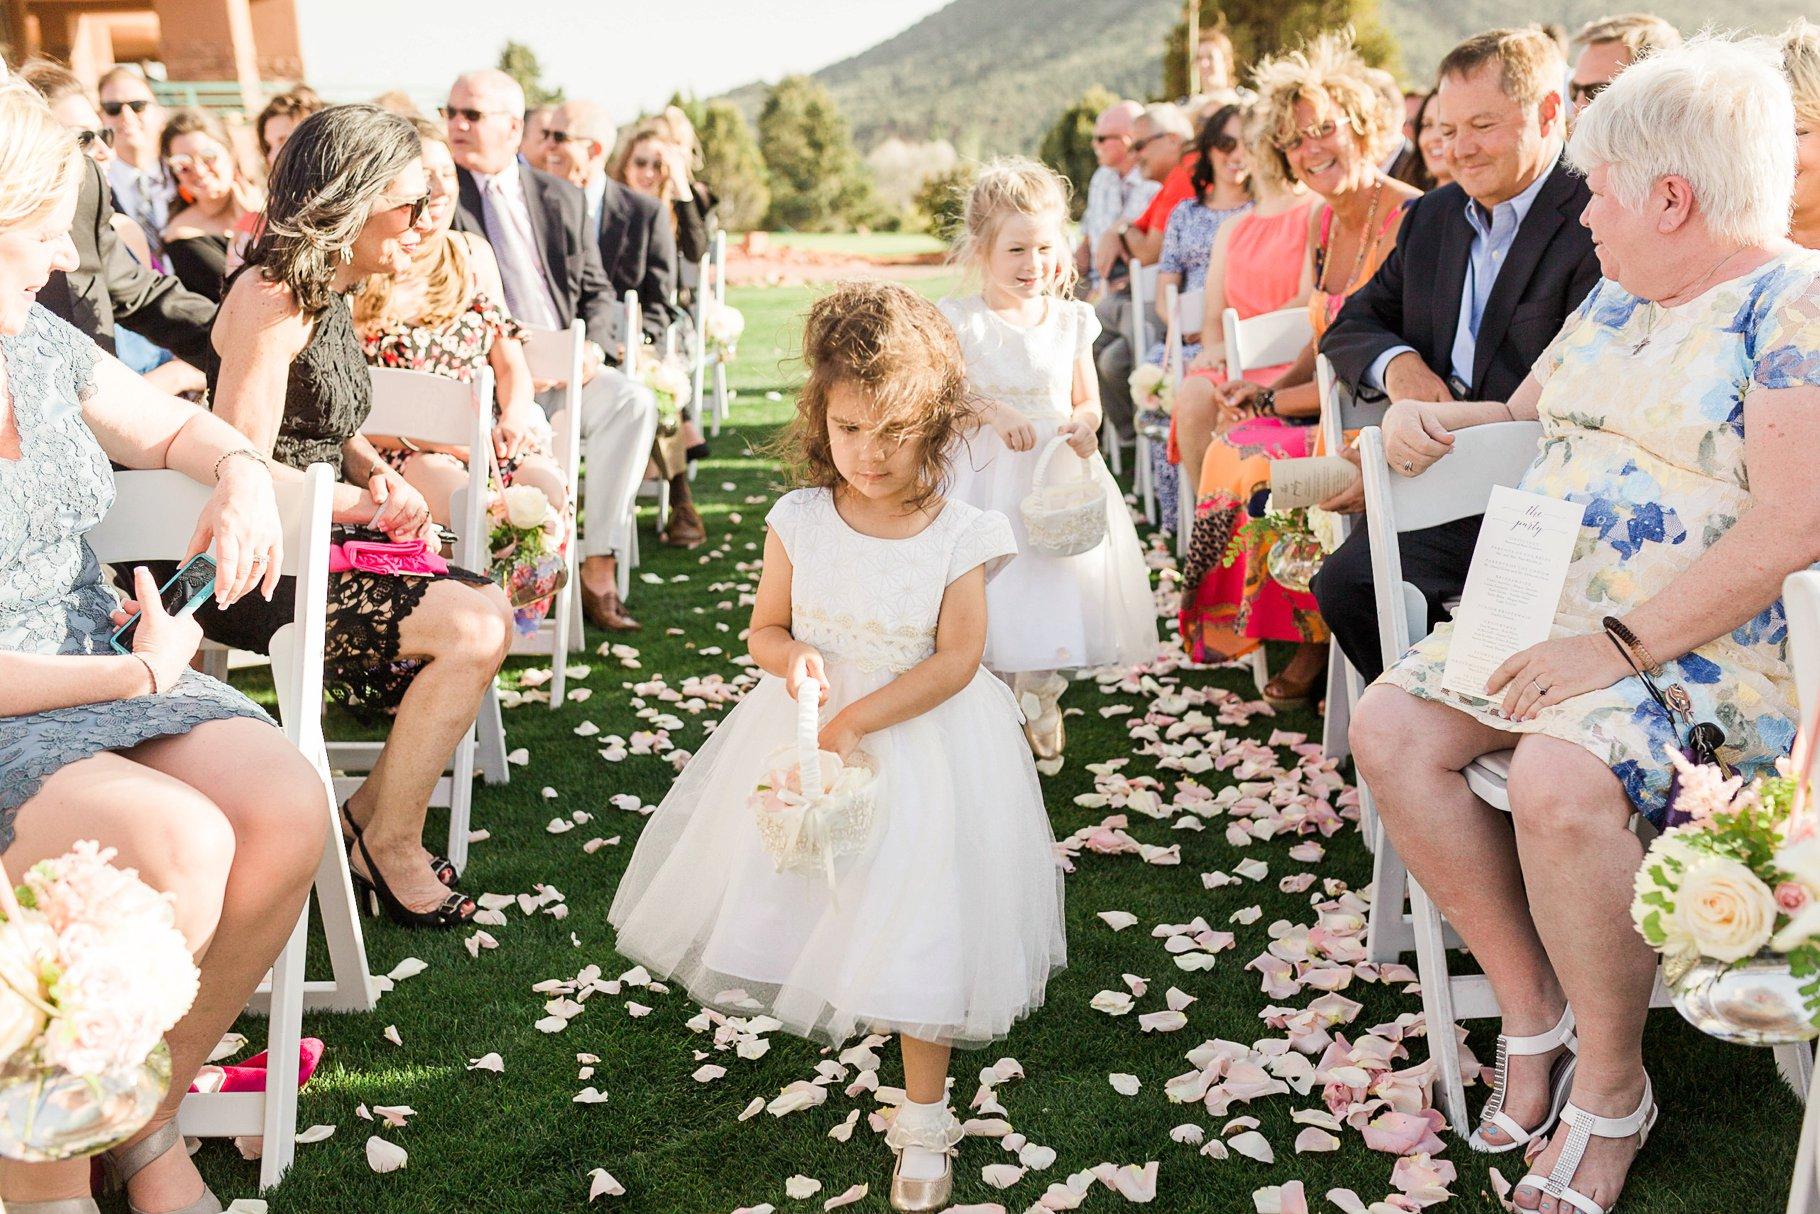 sedona wedding-59_GRETCHEN WAKEMAN PHOTOGRAPHY.jpg